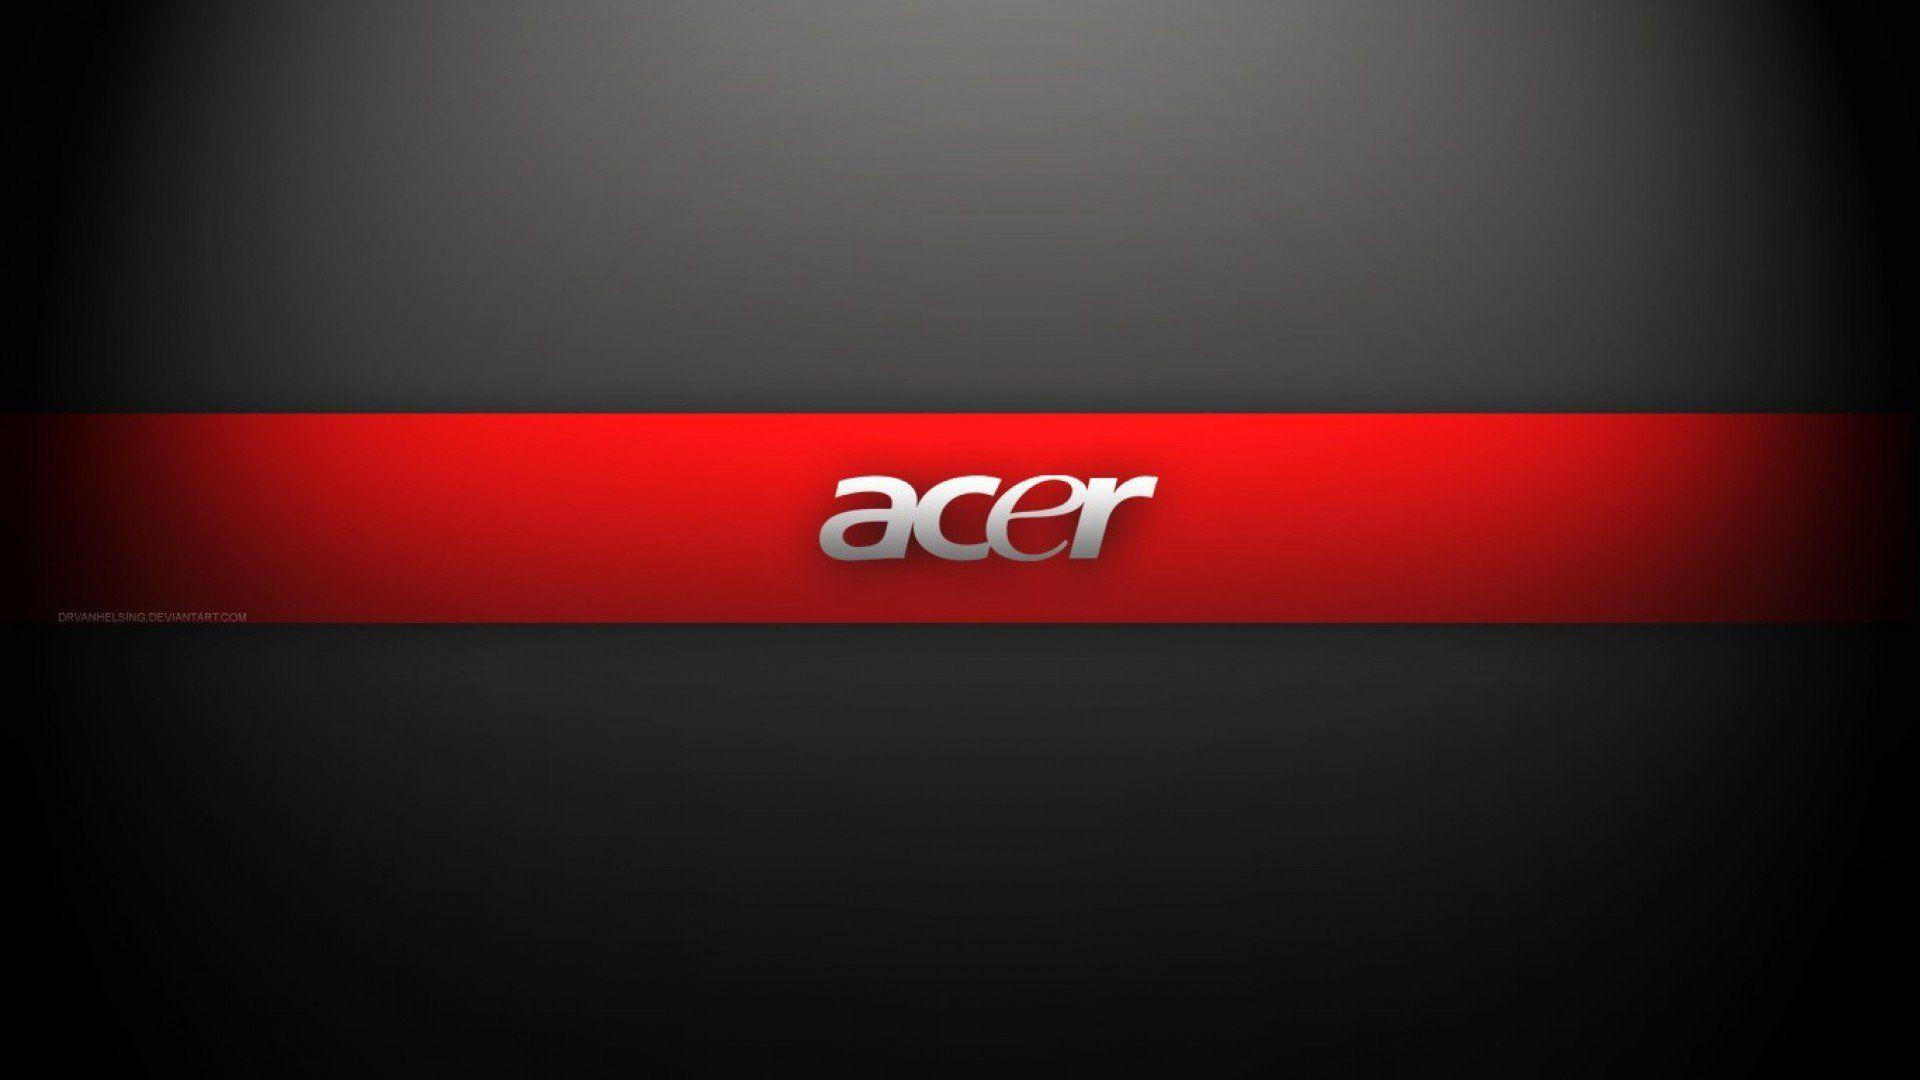 Acer Logo 1920 1080 Red